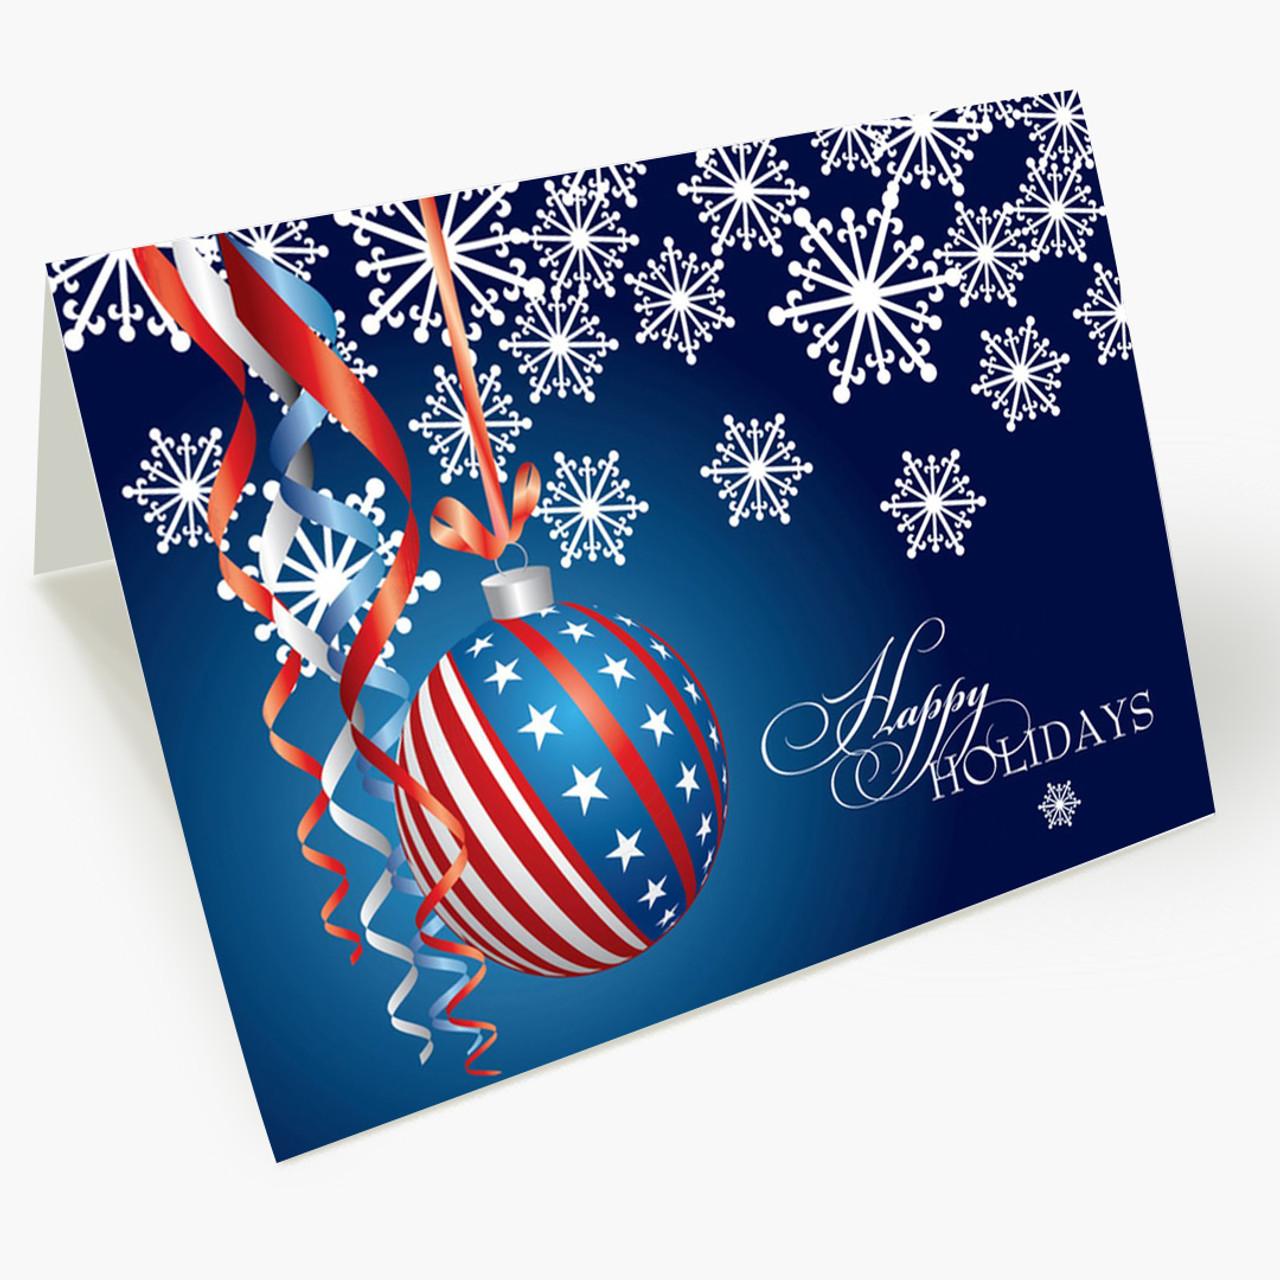 Display With Pride Christmas Card